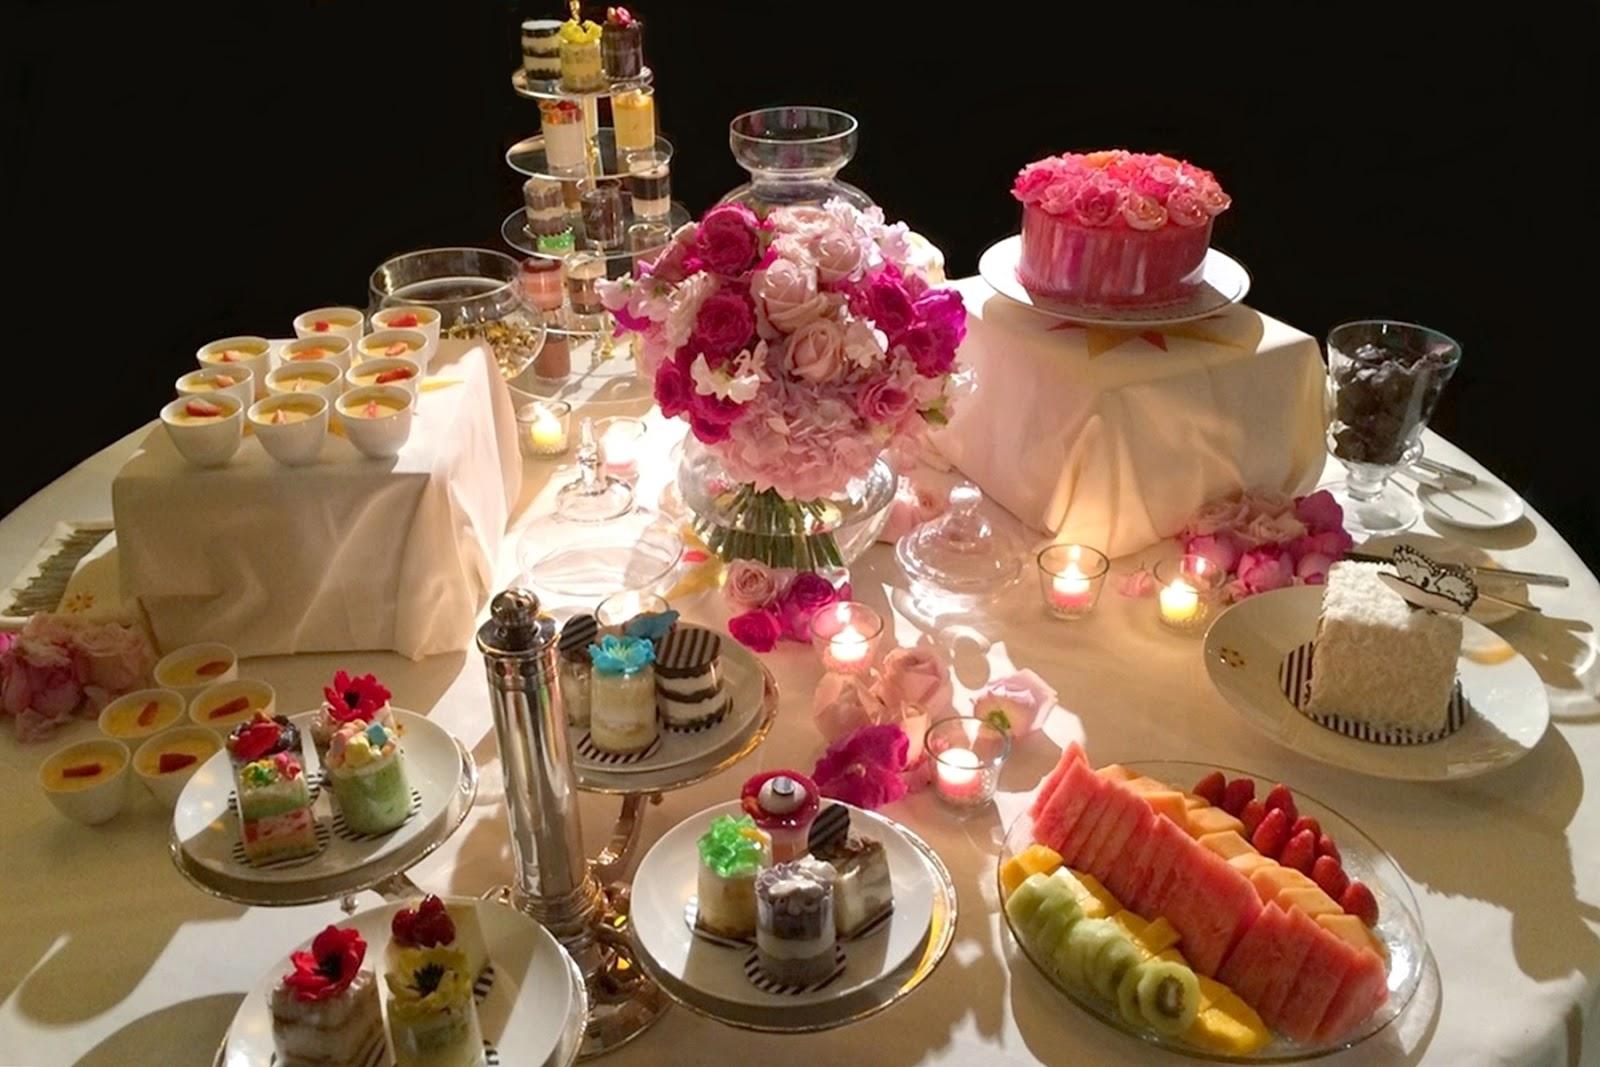 Divine floréal retro chic th wedding anniversary celebration